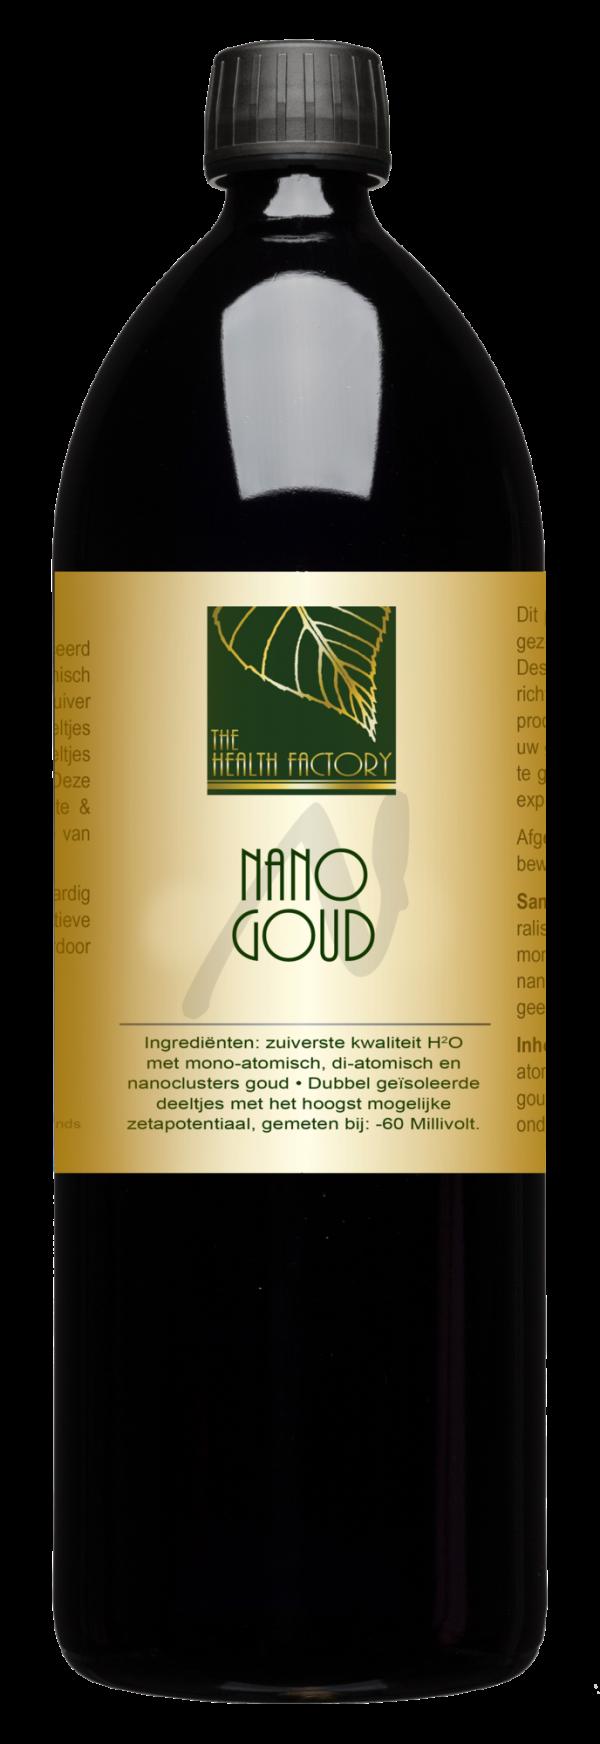 Nano Mineraal Water (Colloïdaal goud) - 1 liter - The Health Factory